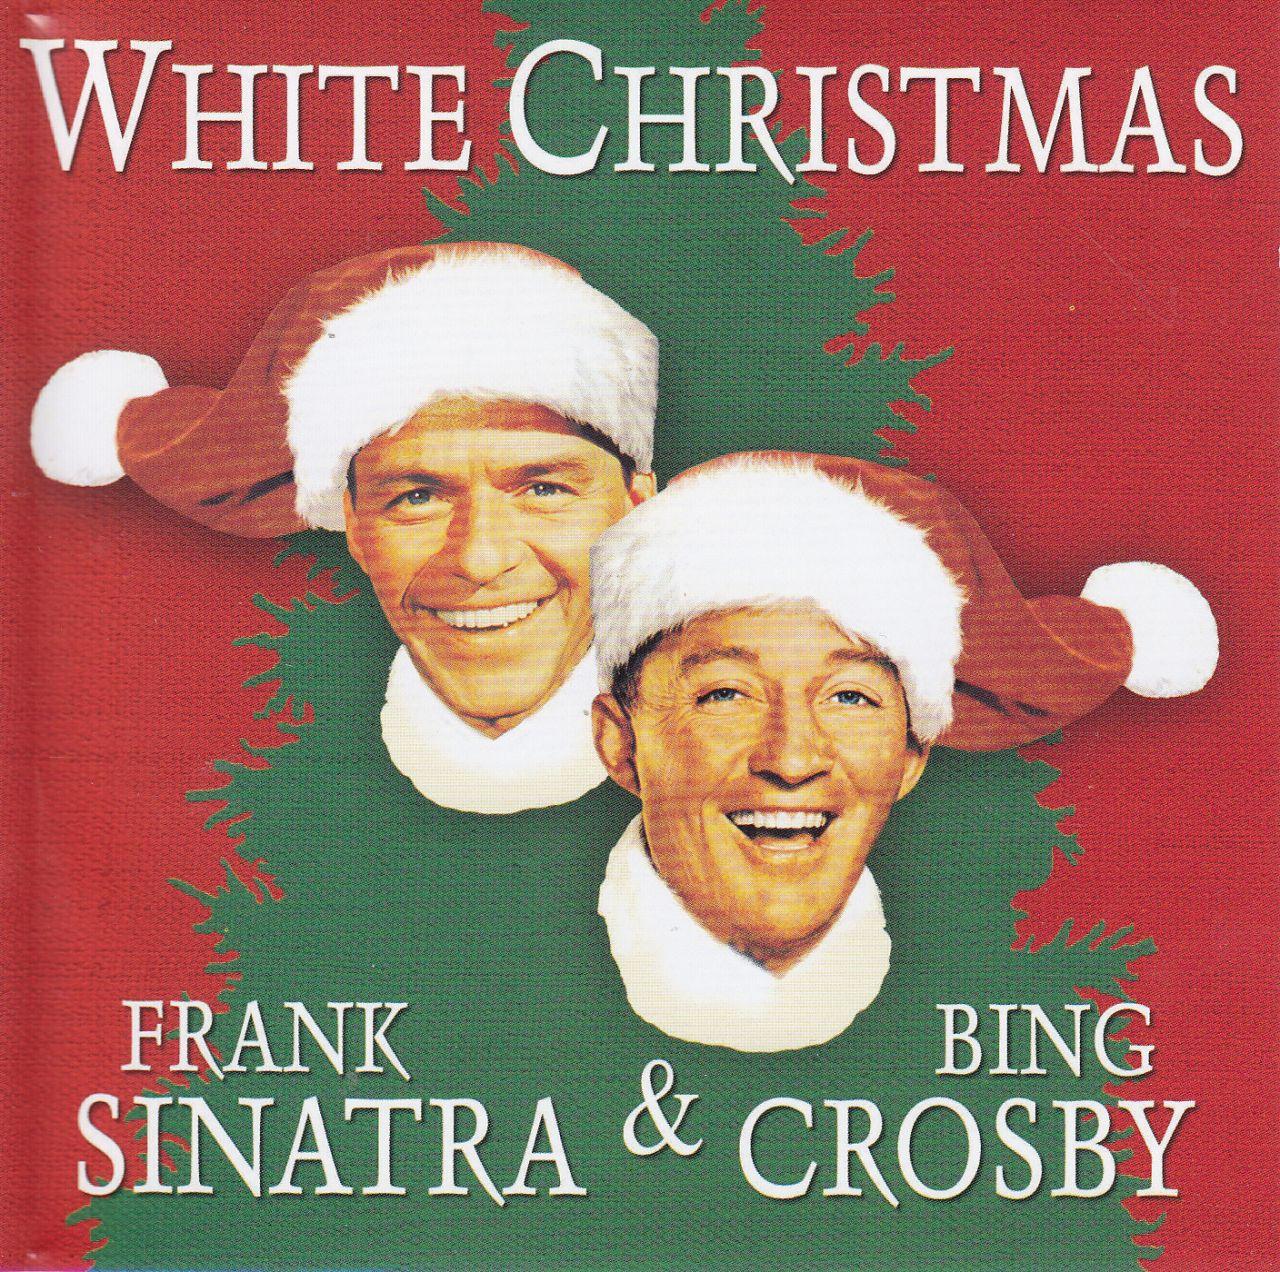 White Christmas – Frank Sinatra & Bing Crosby (CD)